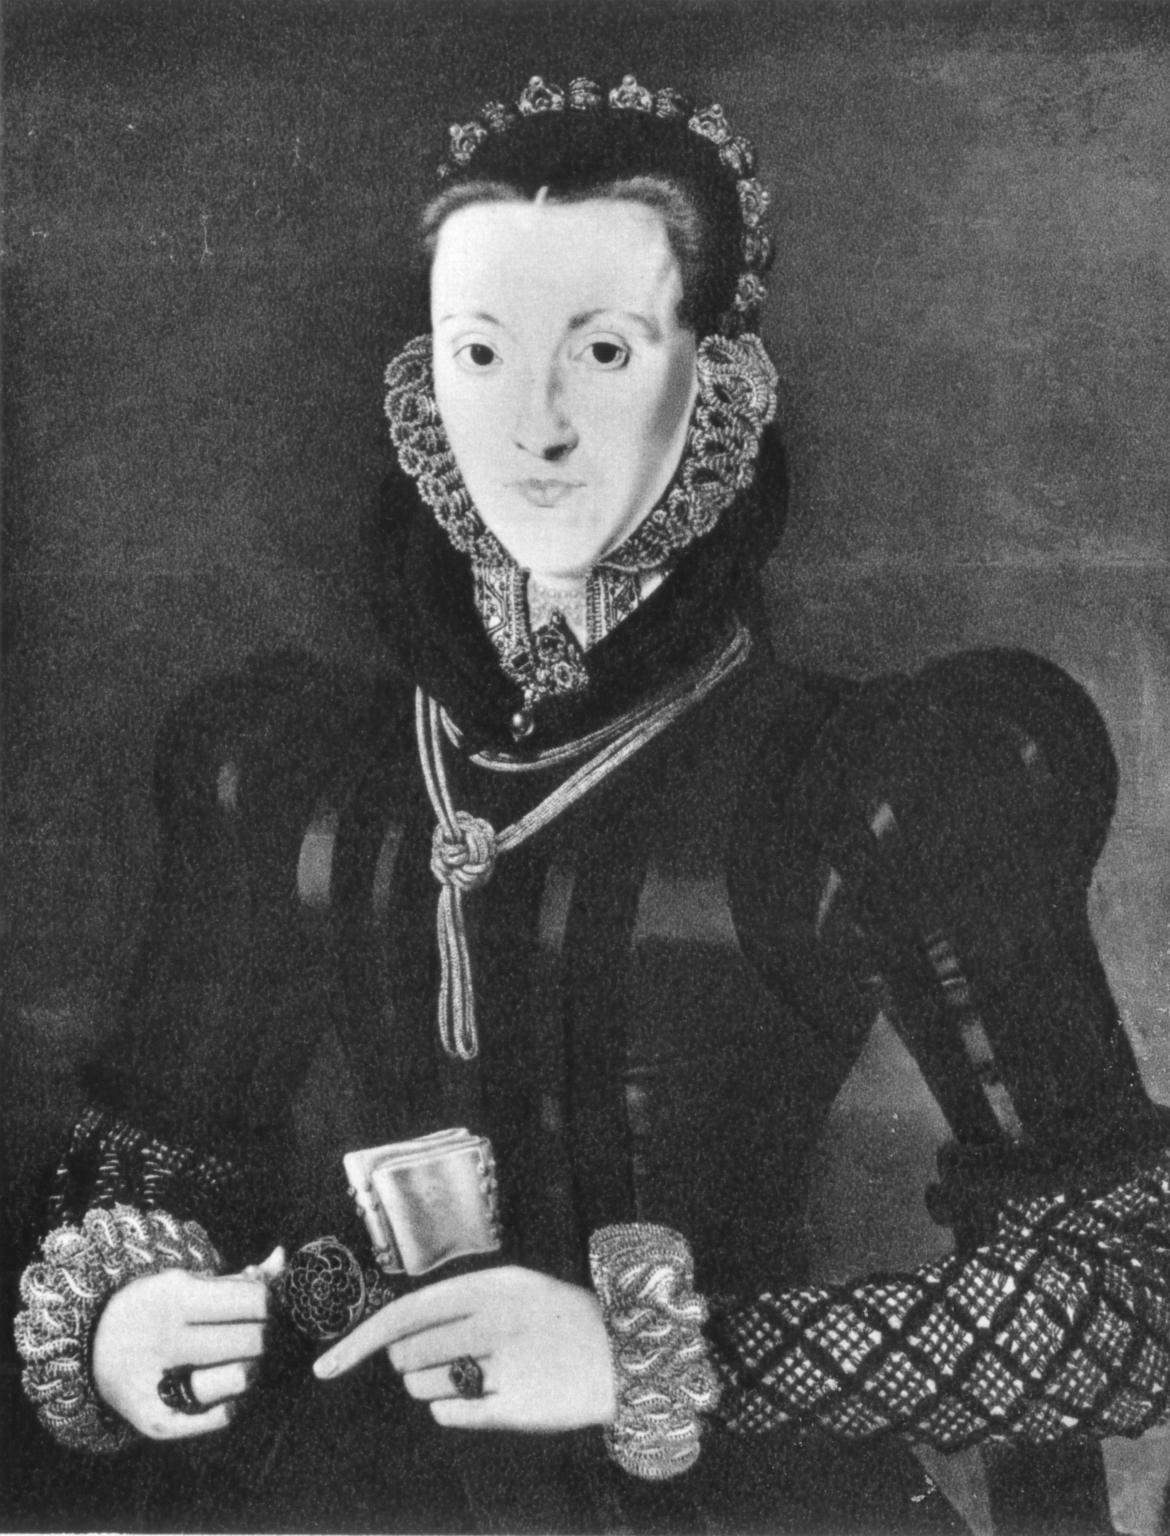 Agnes Keith, Countess of Moray